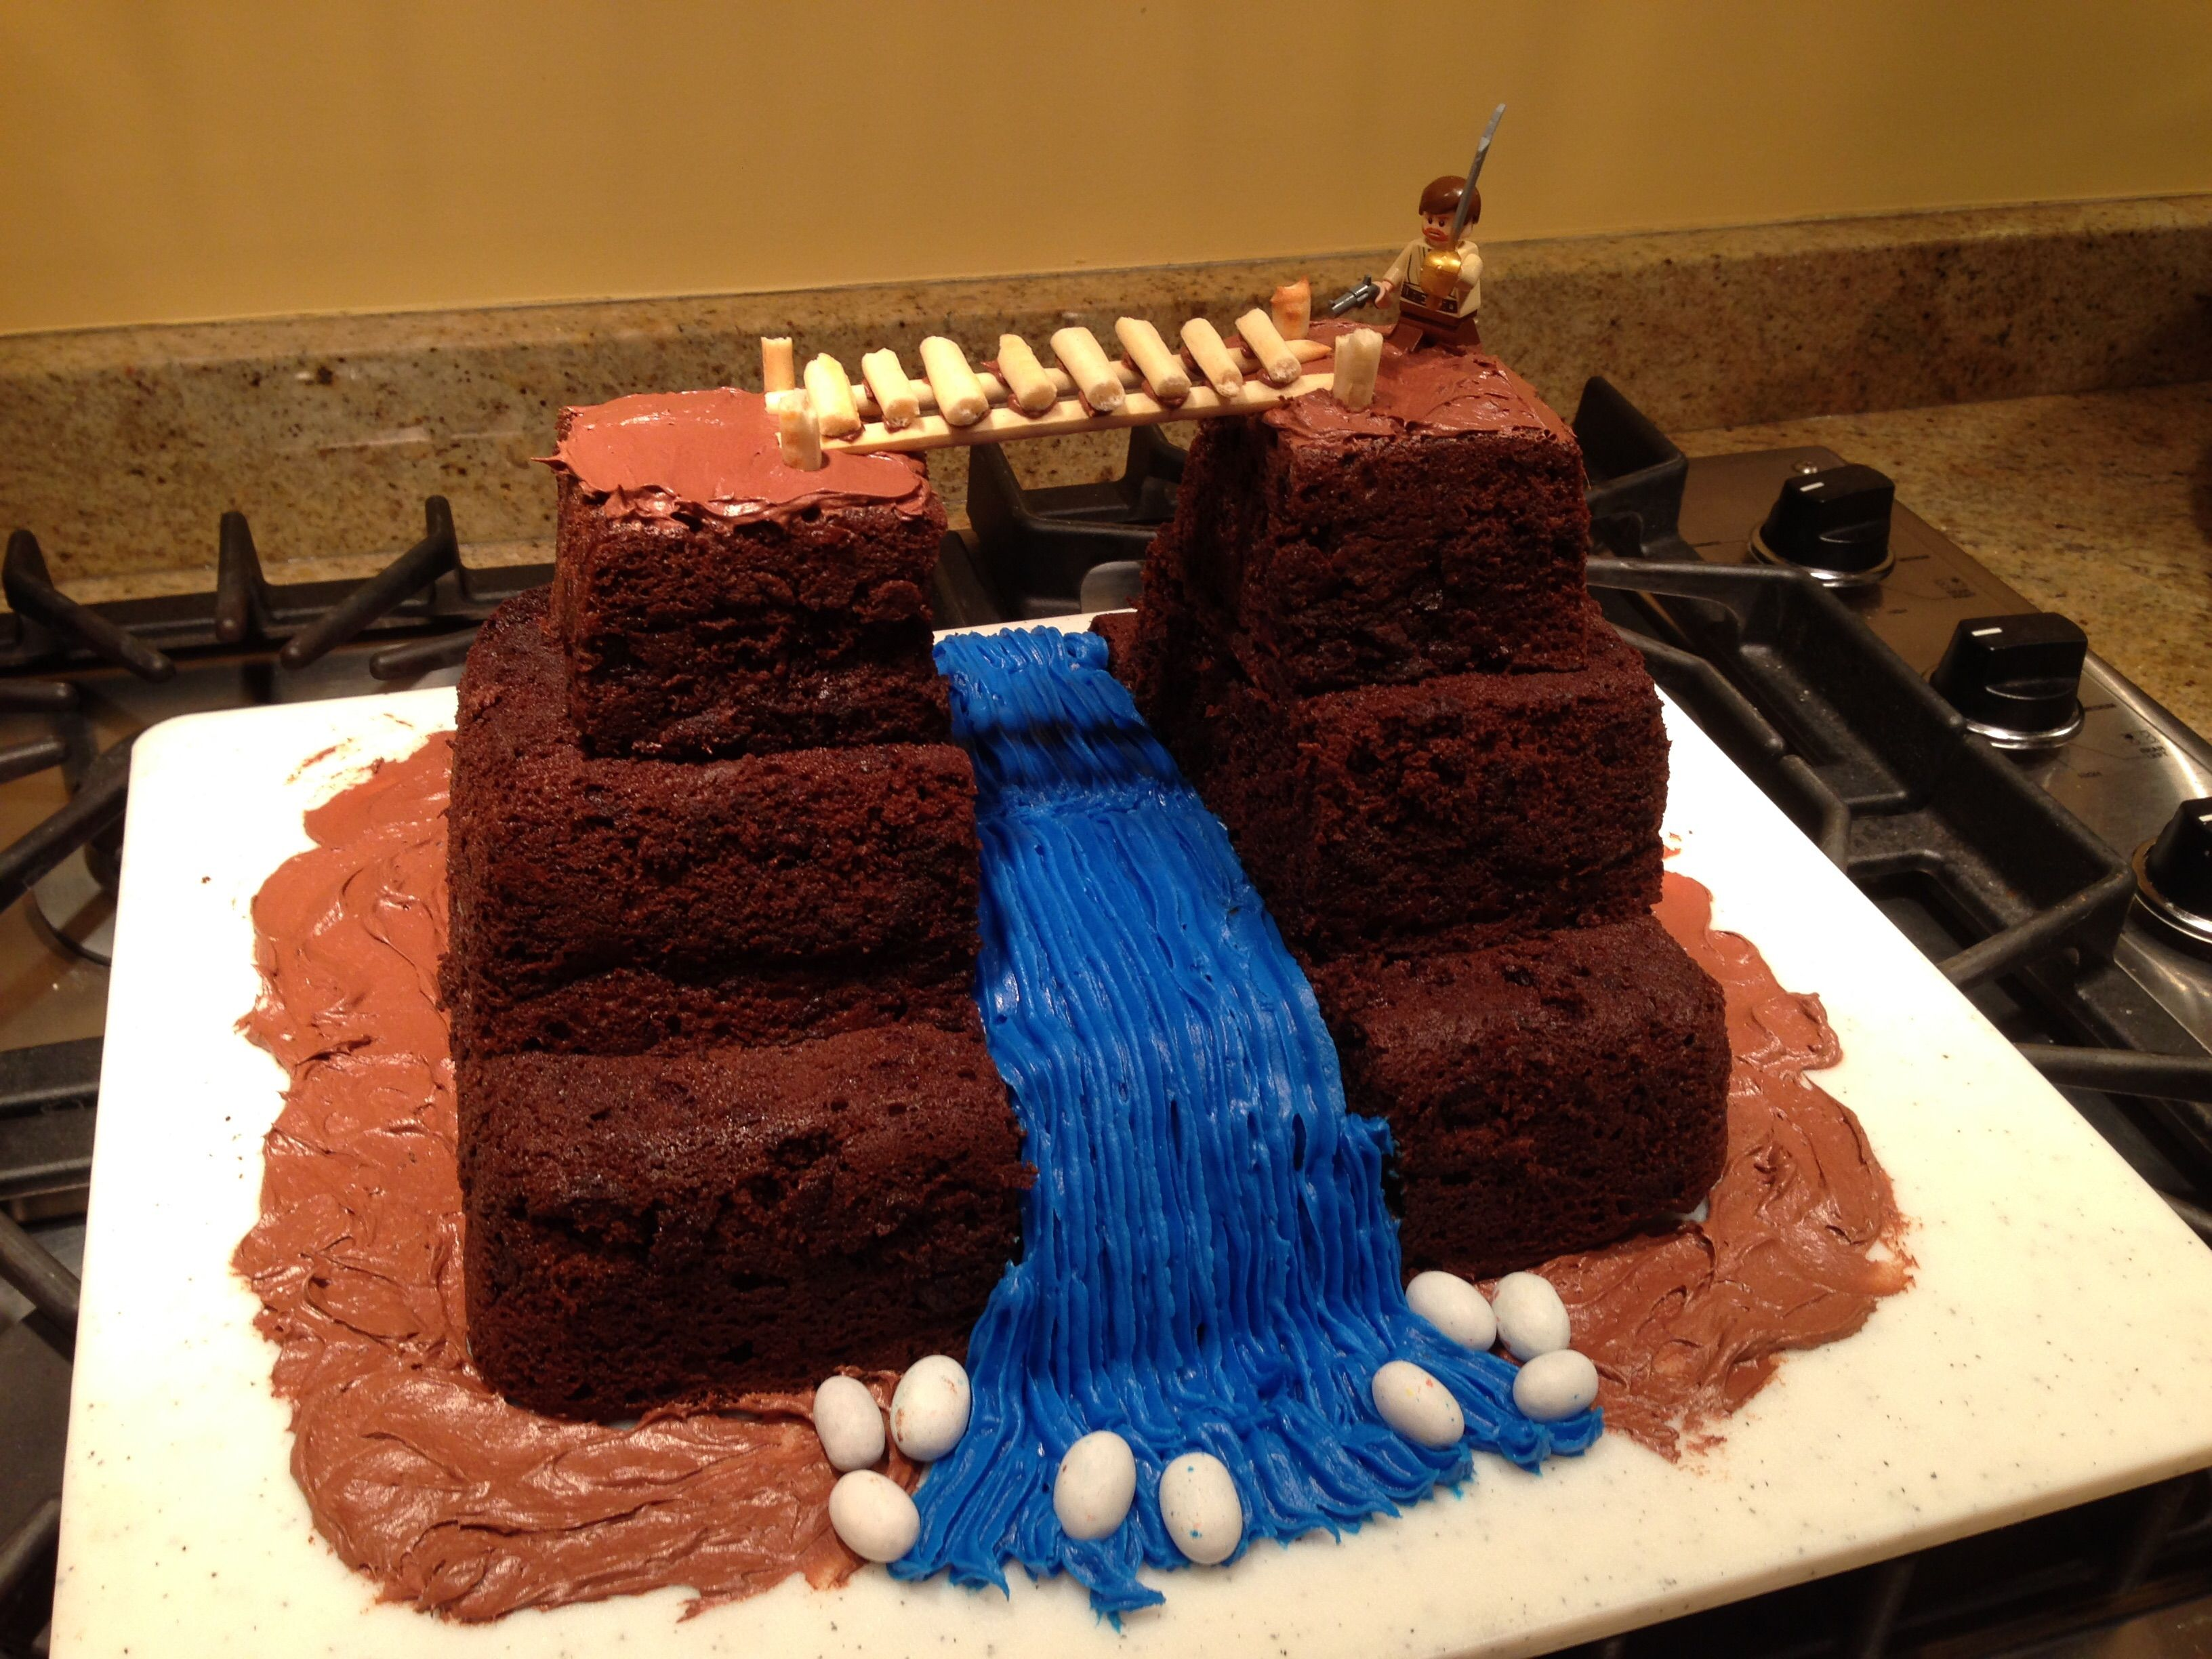 Indiana Jones temple of doom birthday cake